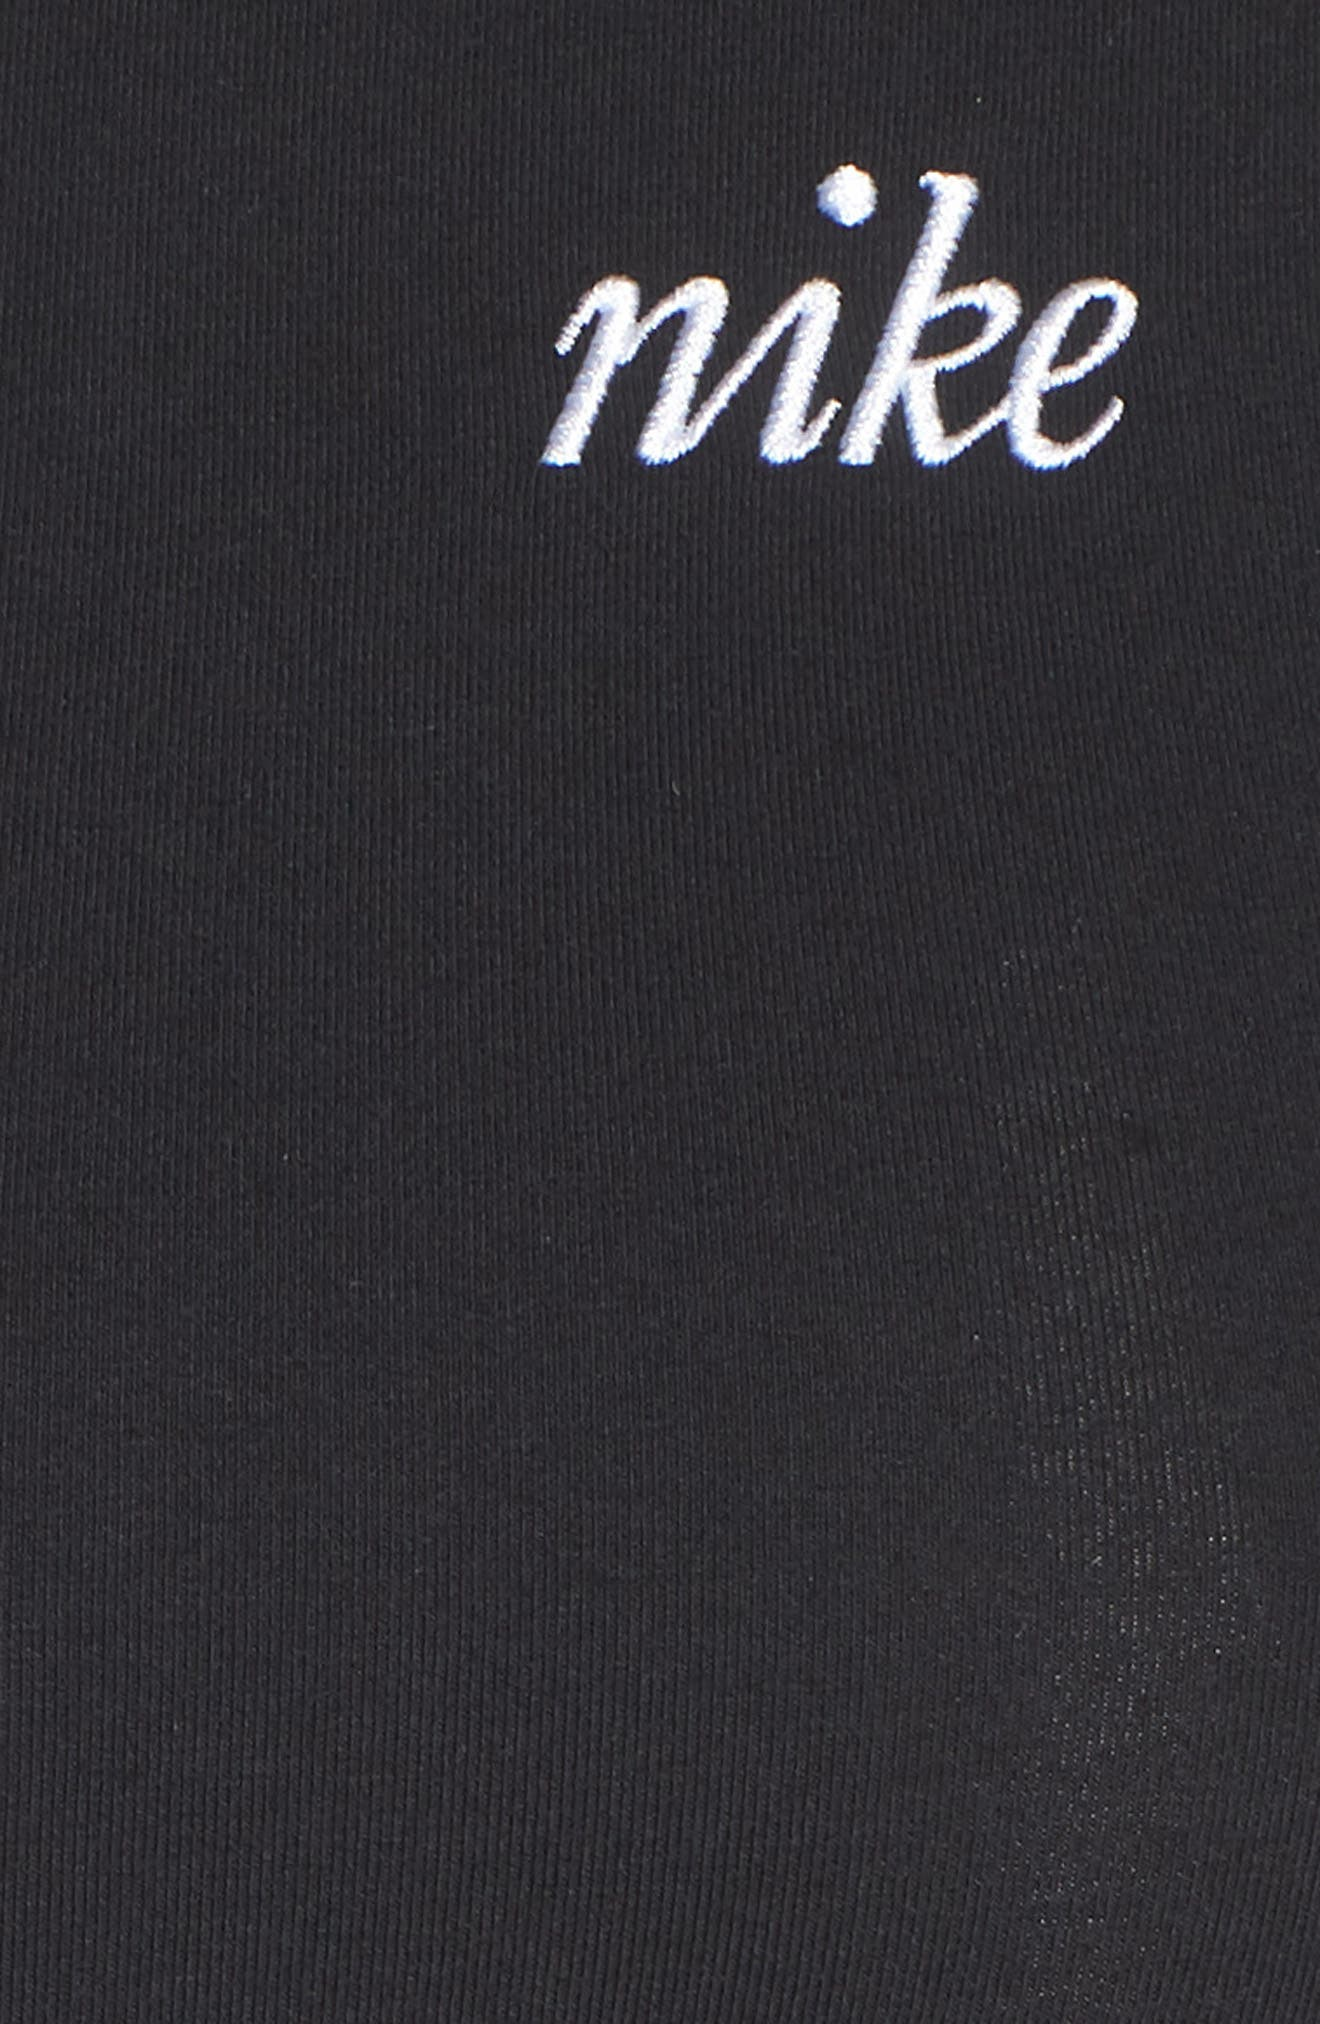 Sportswear T-Shirt Dress,                             Alternate thumbnail 6, color,                             Black/ White